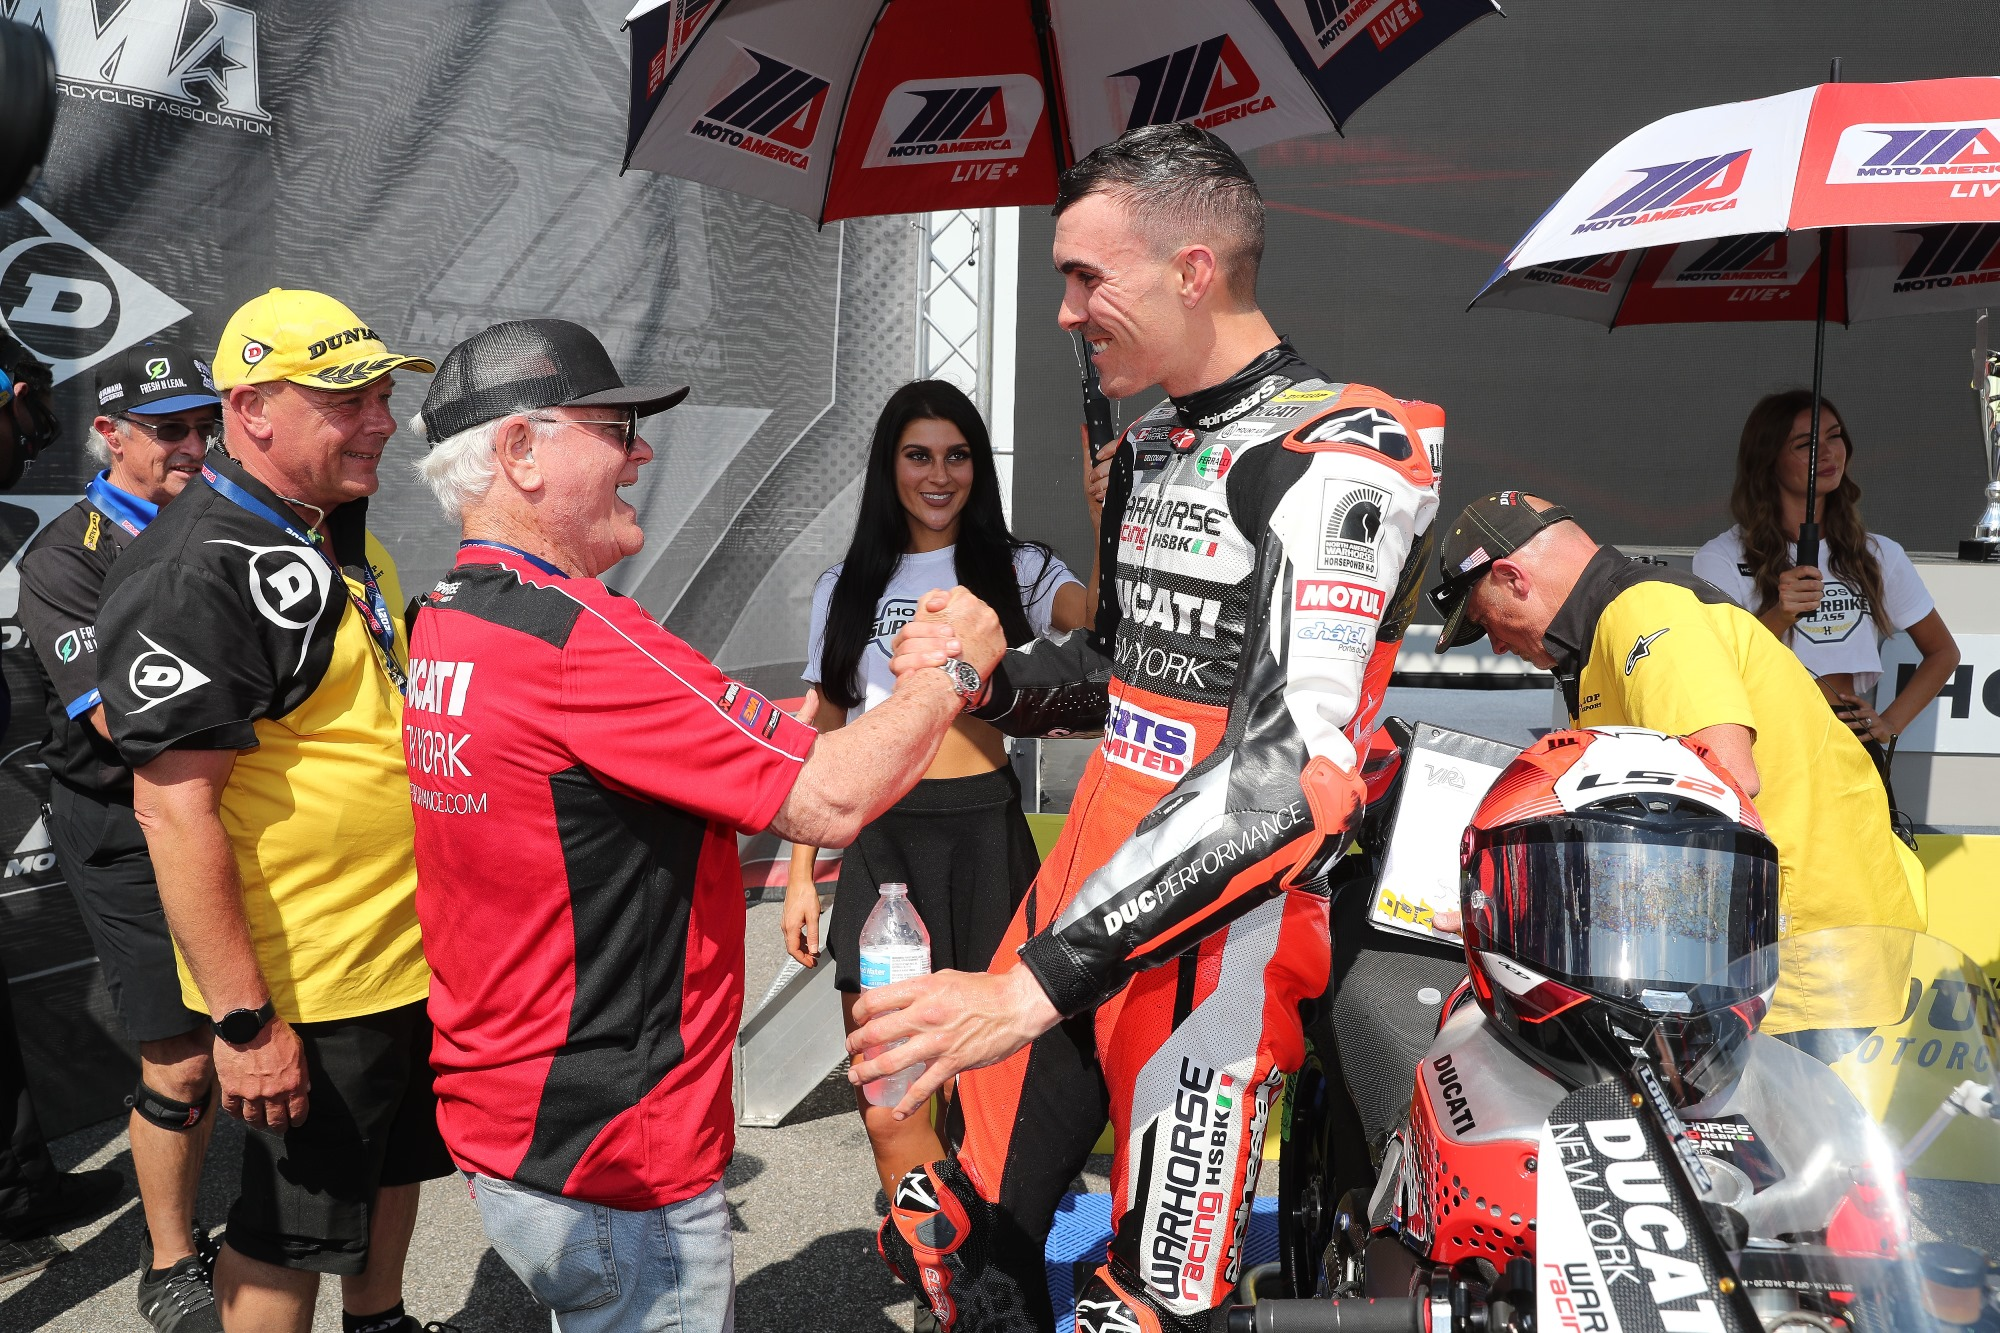 Warhorse HSBK Racing Ducati Team Nabs First Podium of Season at VIR MotoAmerica